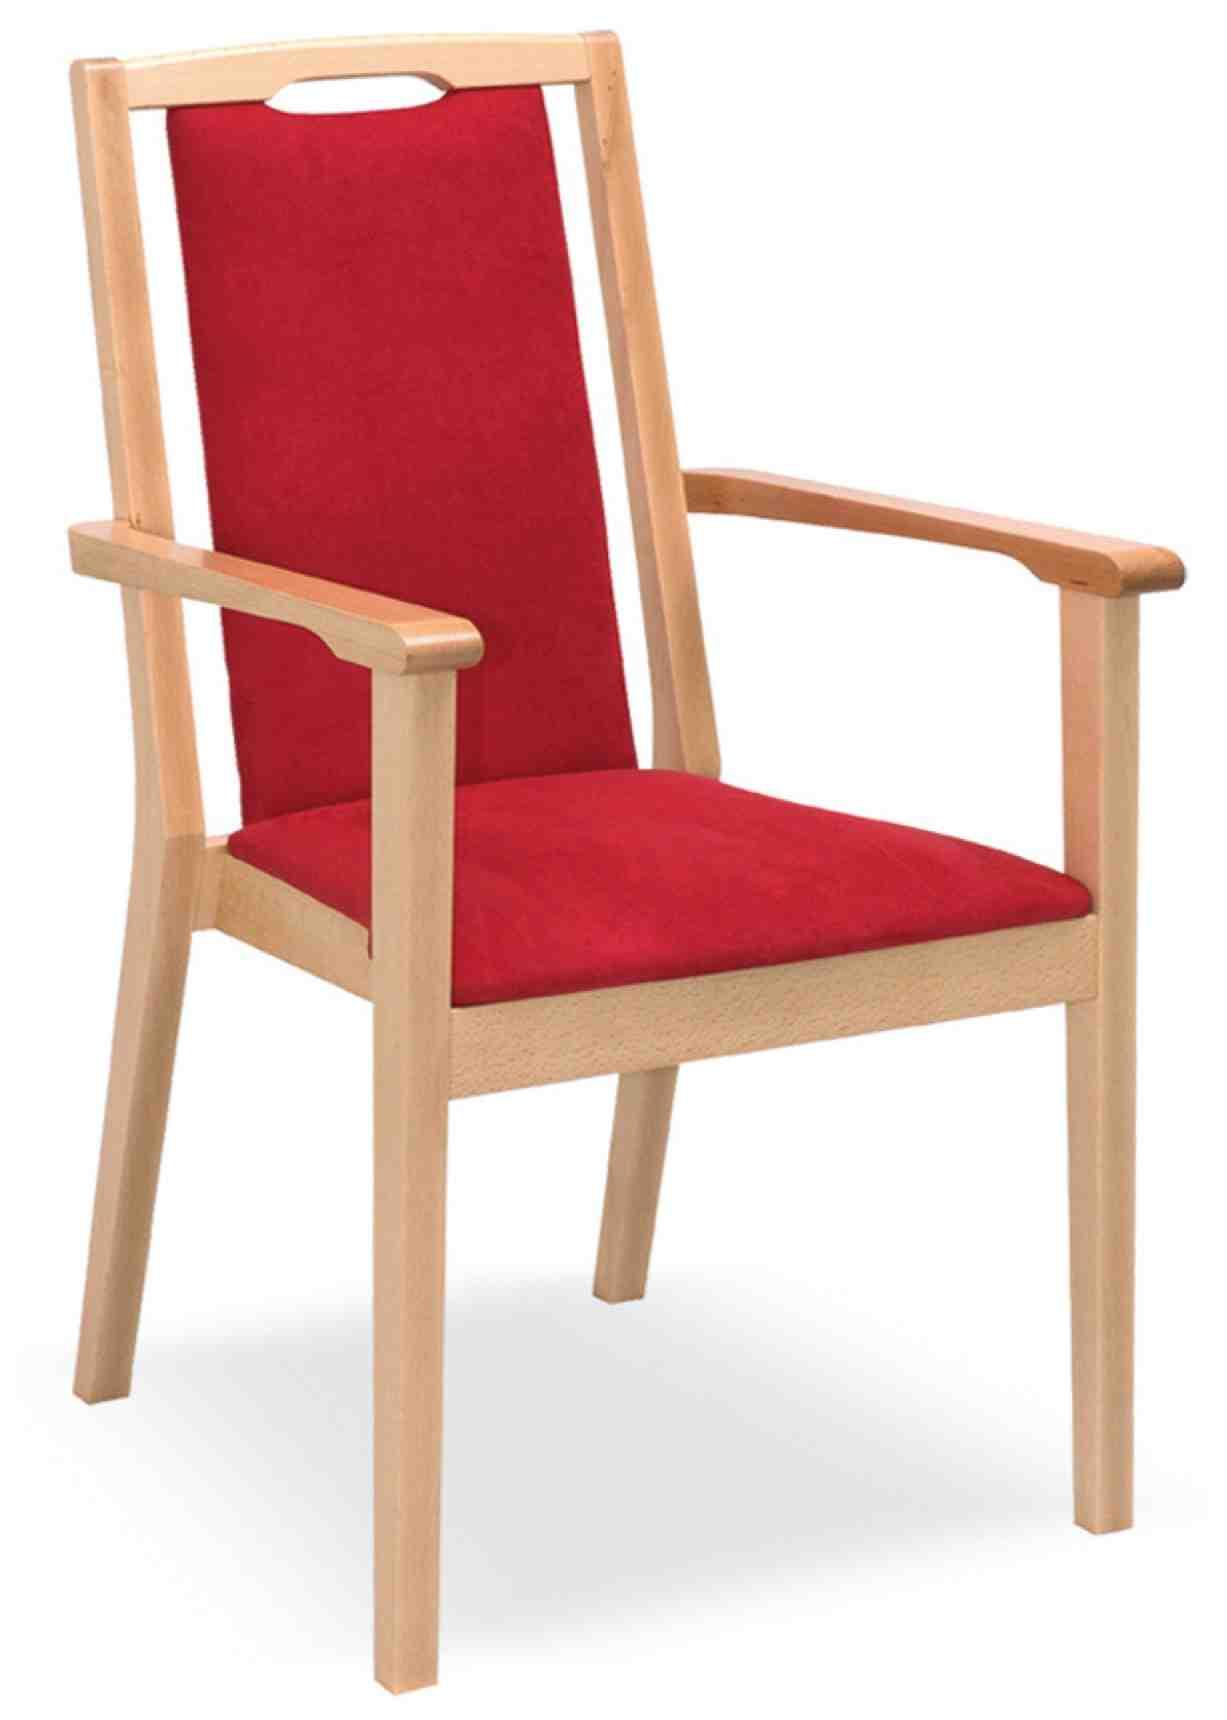 massivholz hochlehner sarajewo 2 stoffbezug mit n sseschutz st hle mit holzgestell. Black Bedroom Furniture Sets. Home Design Ideas